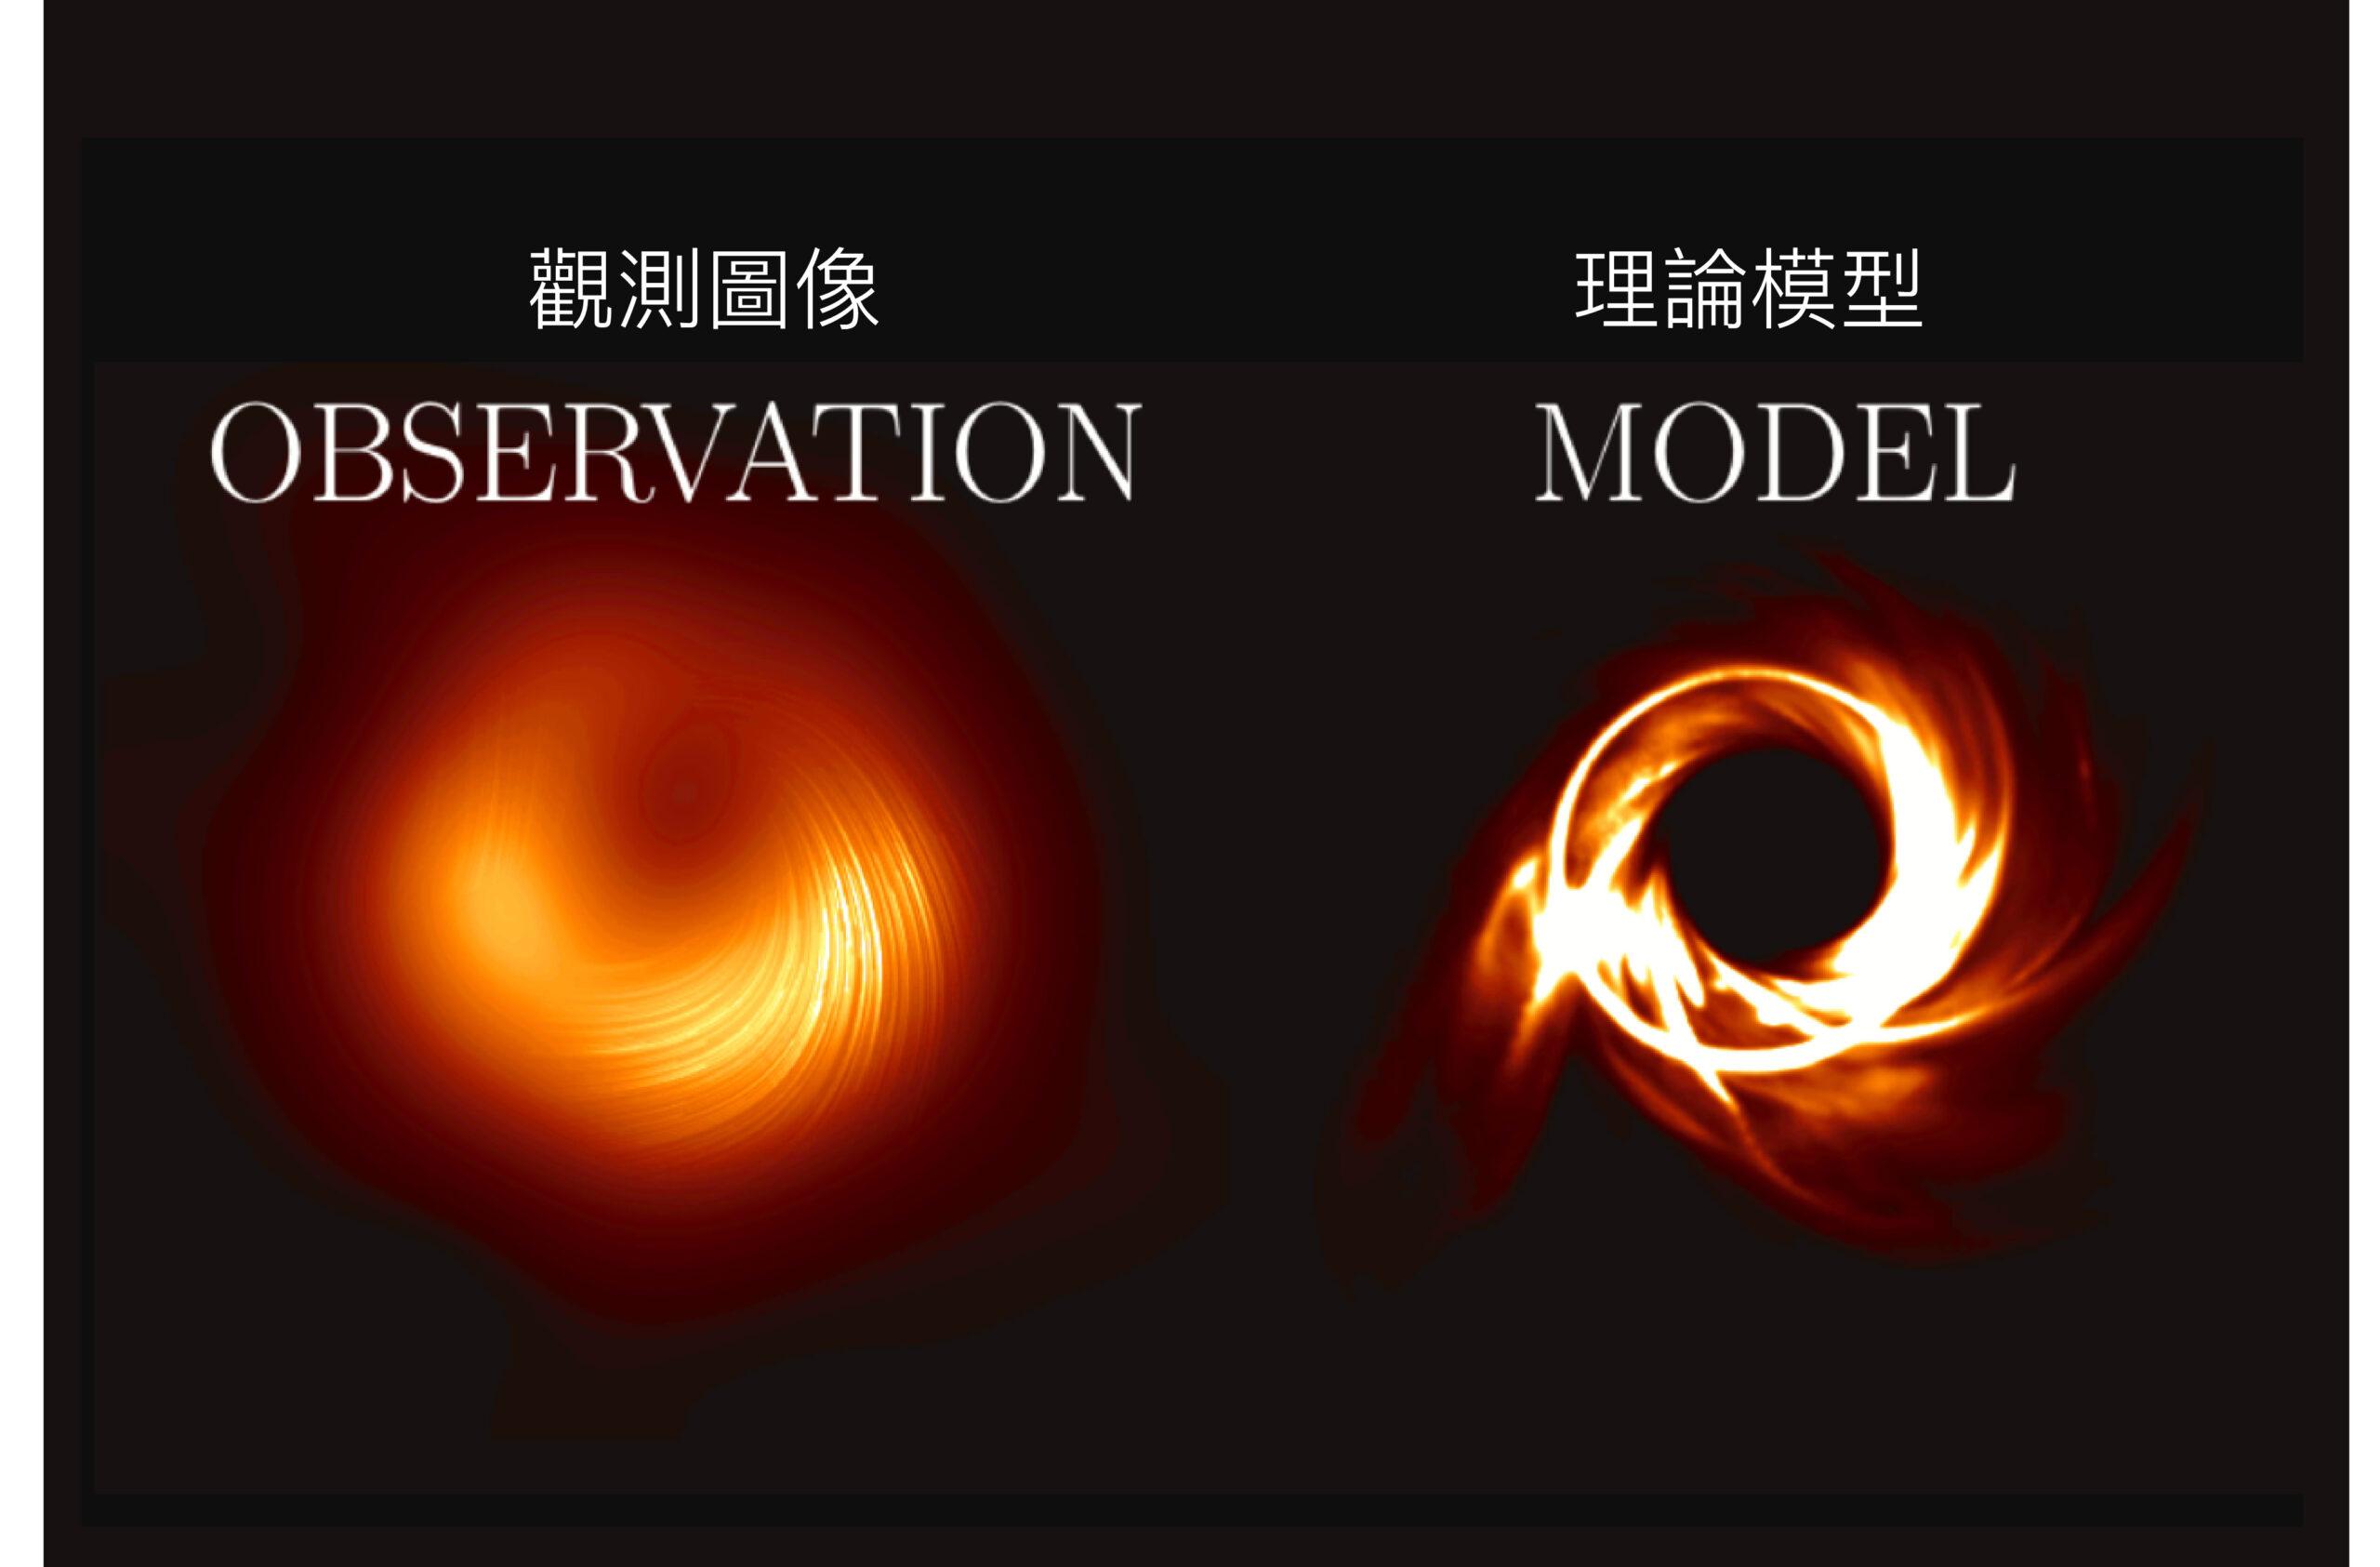 M87 黑洞觀測影像與理論模型比較,可預期未來觀測解析度提高之後,有機會看到更多細緻的結構。 圖│S. Issaoun, M. Mościbrodzka with Polarimetry WG and OWG